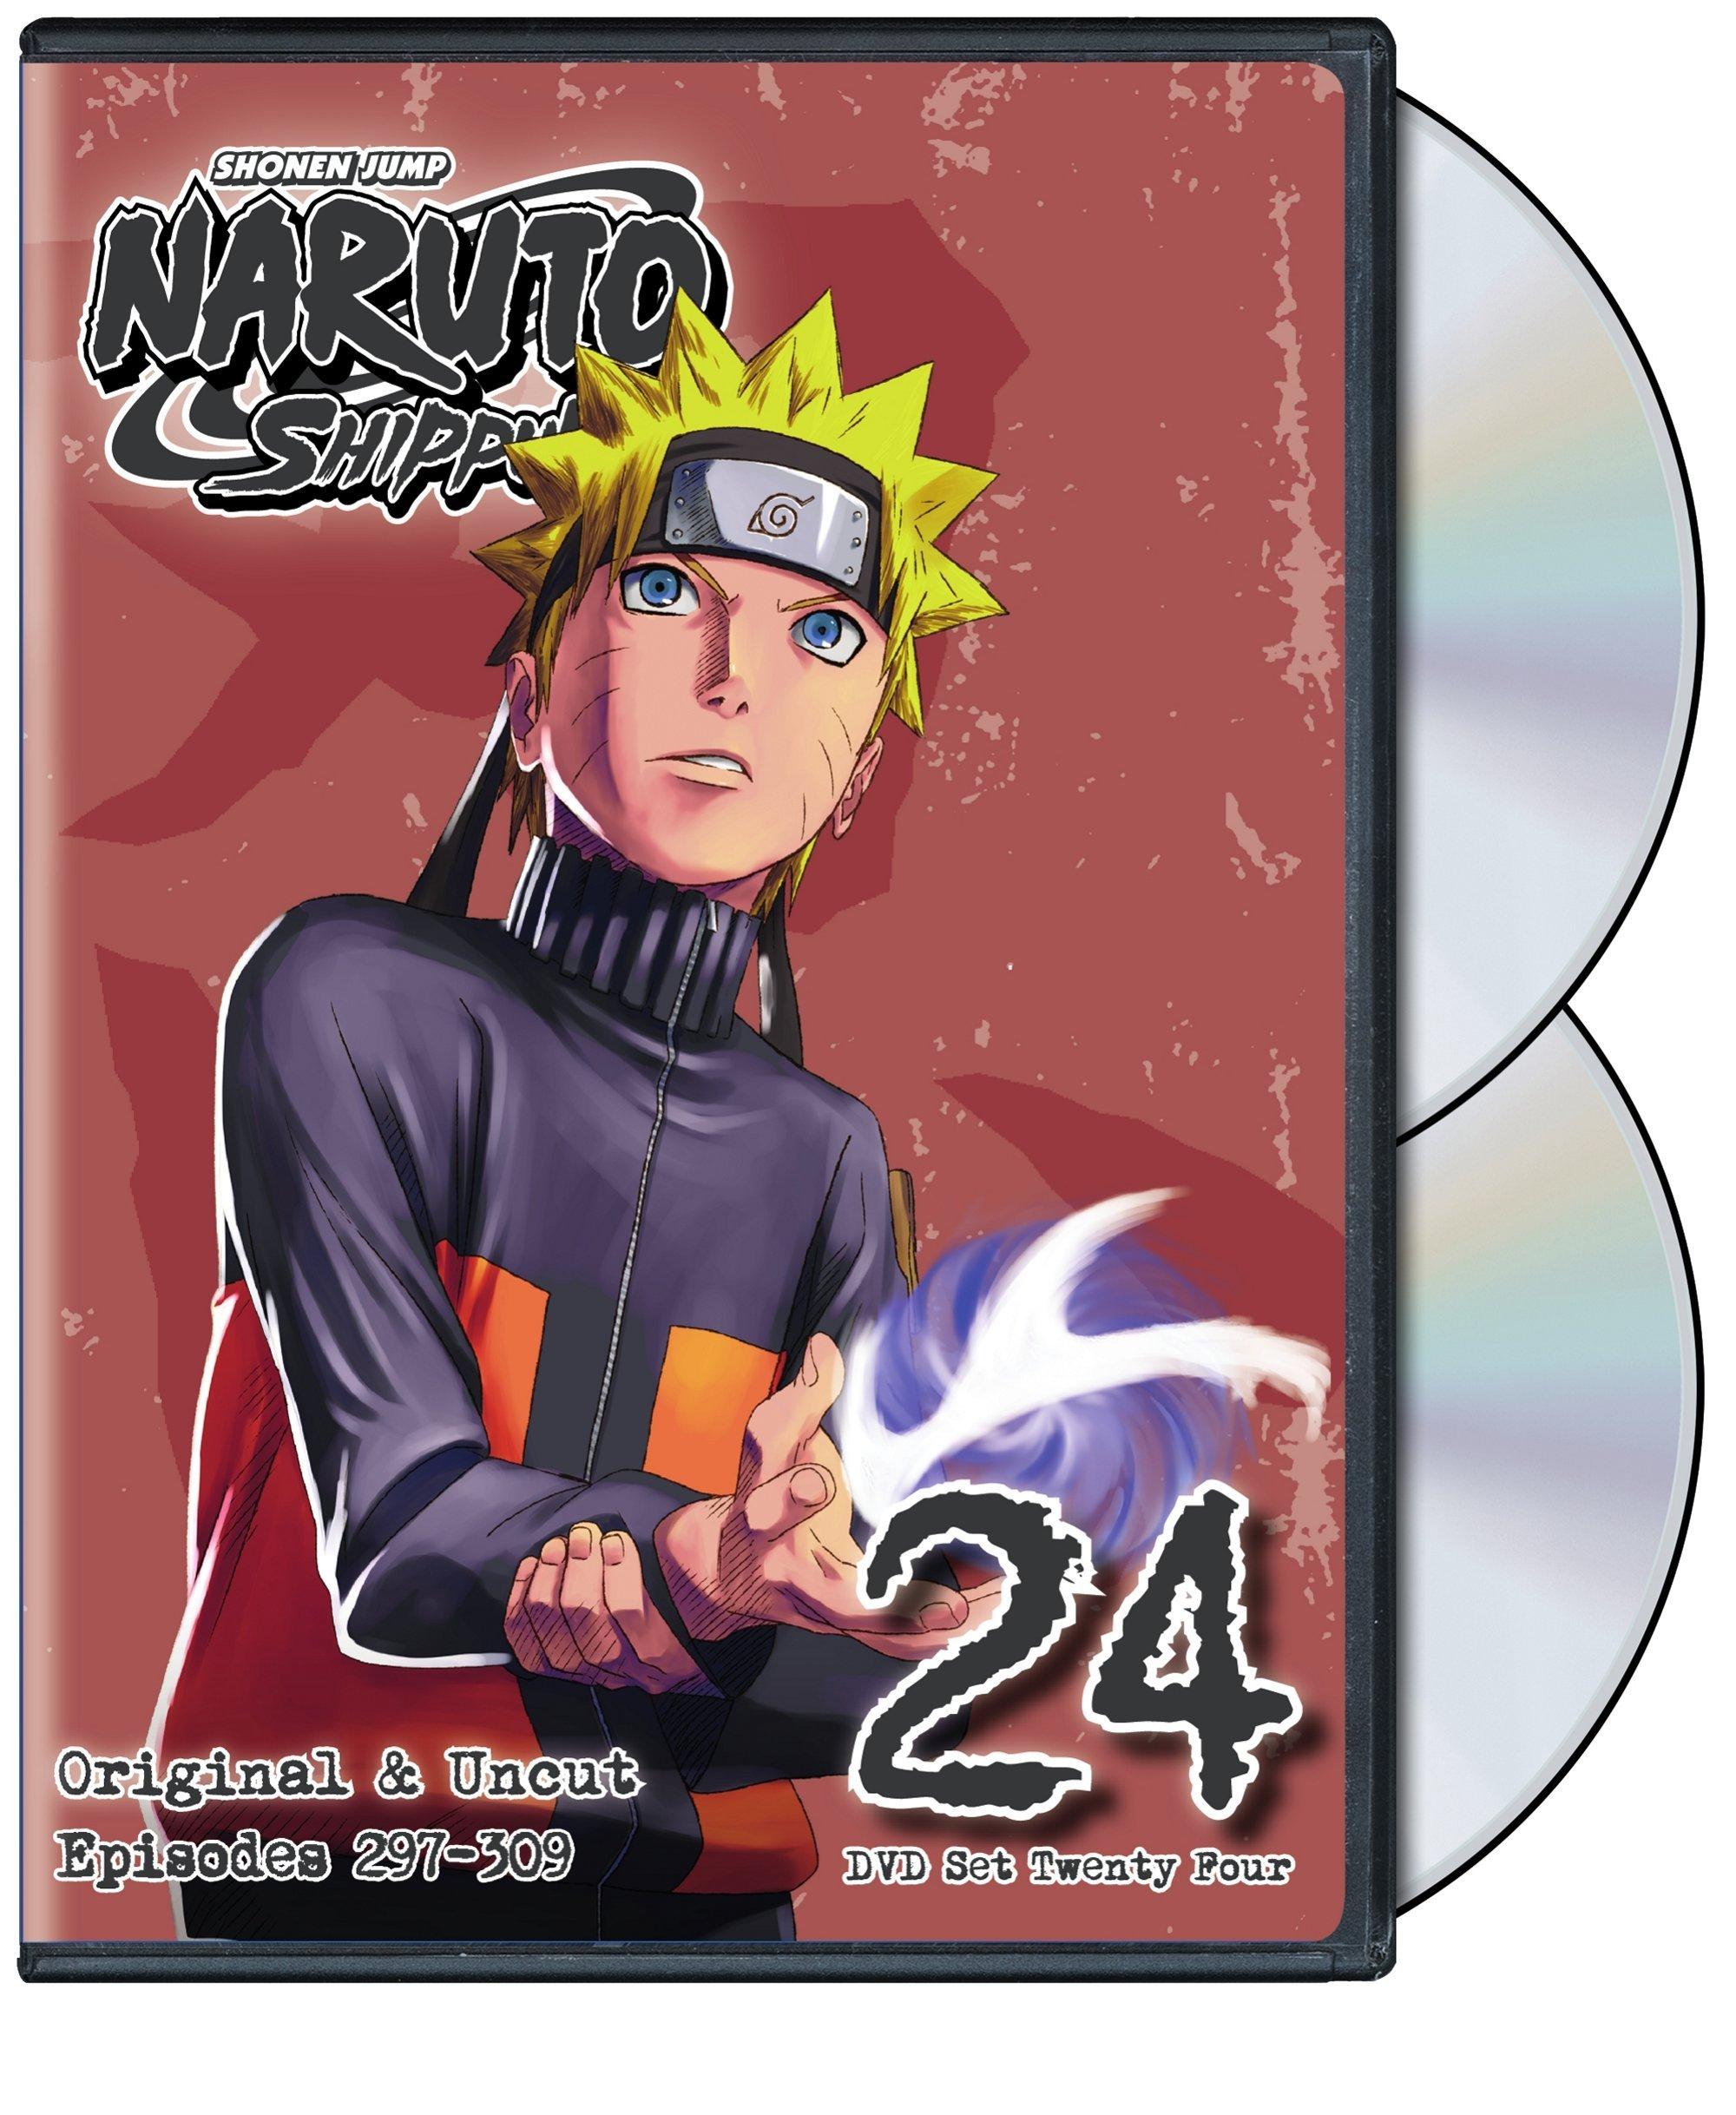 Details about Naruto Shippuden Uncut DVD Set 24 Anime Episodes Shippuden  English Dub Ninja TV